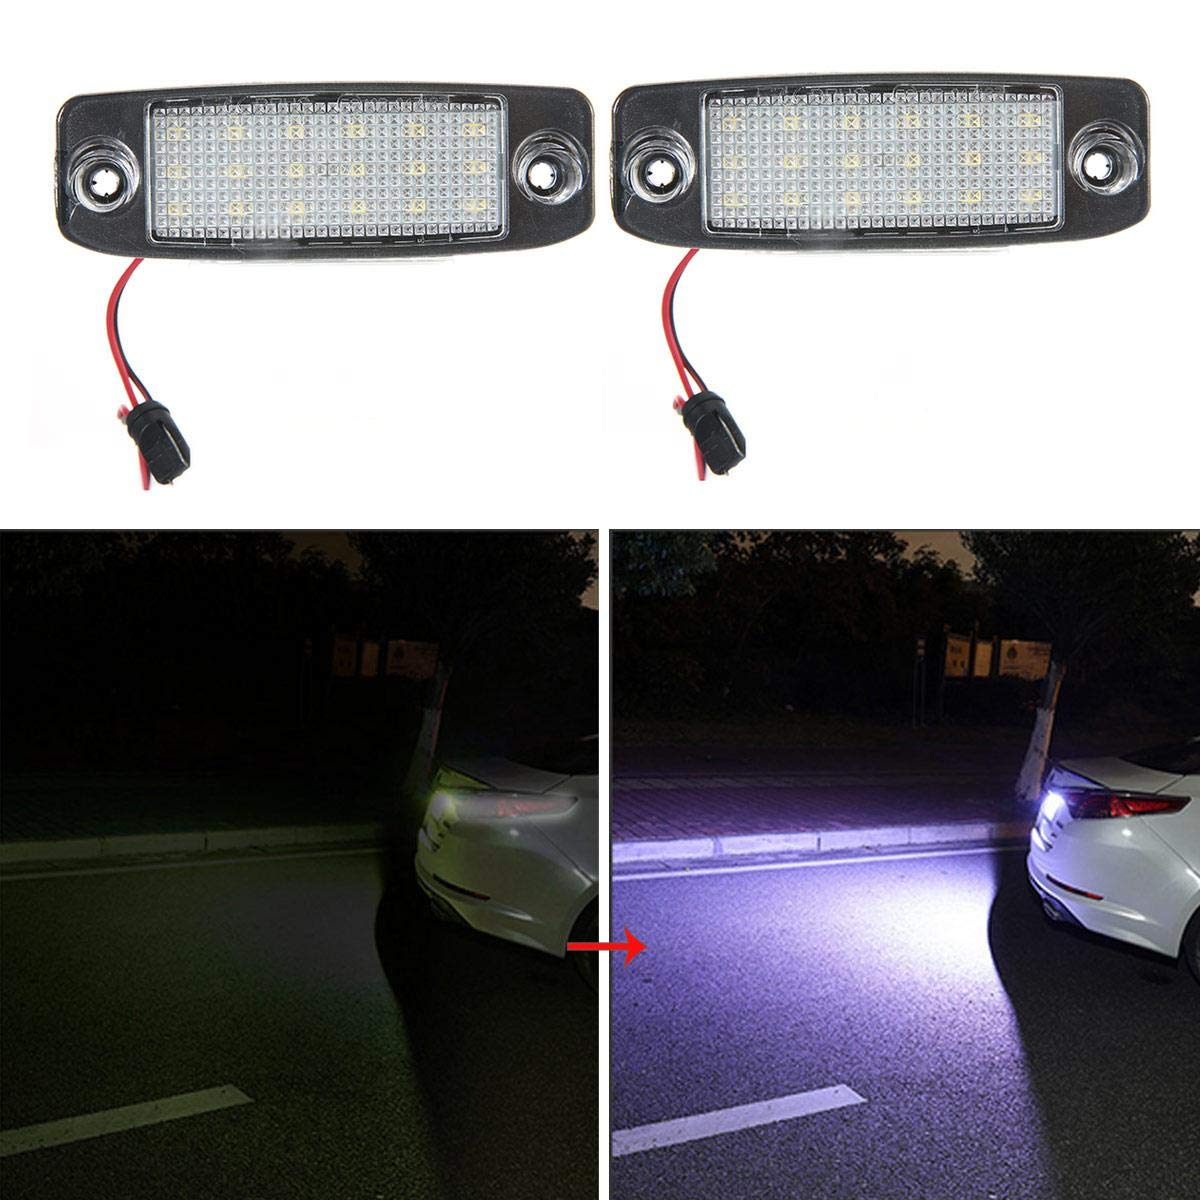 DokFin 2 Pezzi luci Targa Auto LED Lampada Targa per Hyundai Tuscon 2005-2009 kia sportage 2009-2019